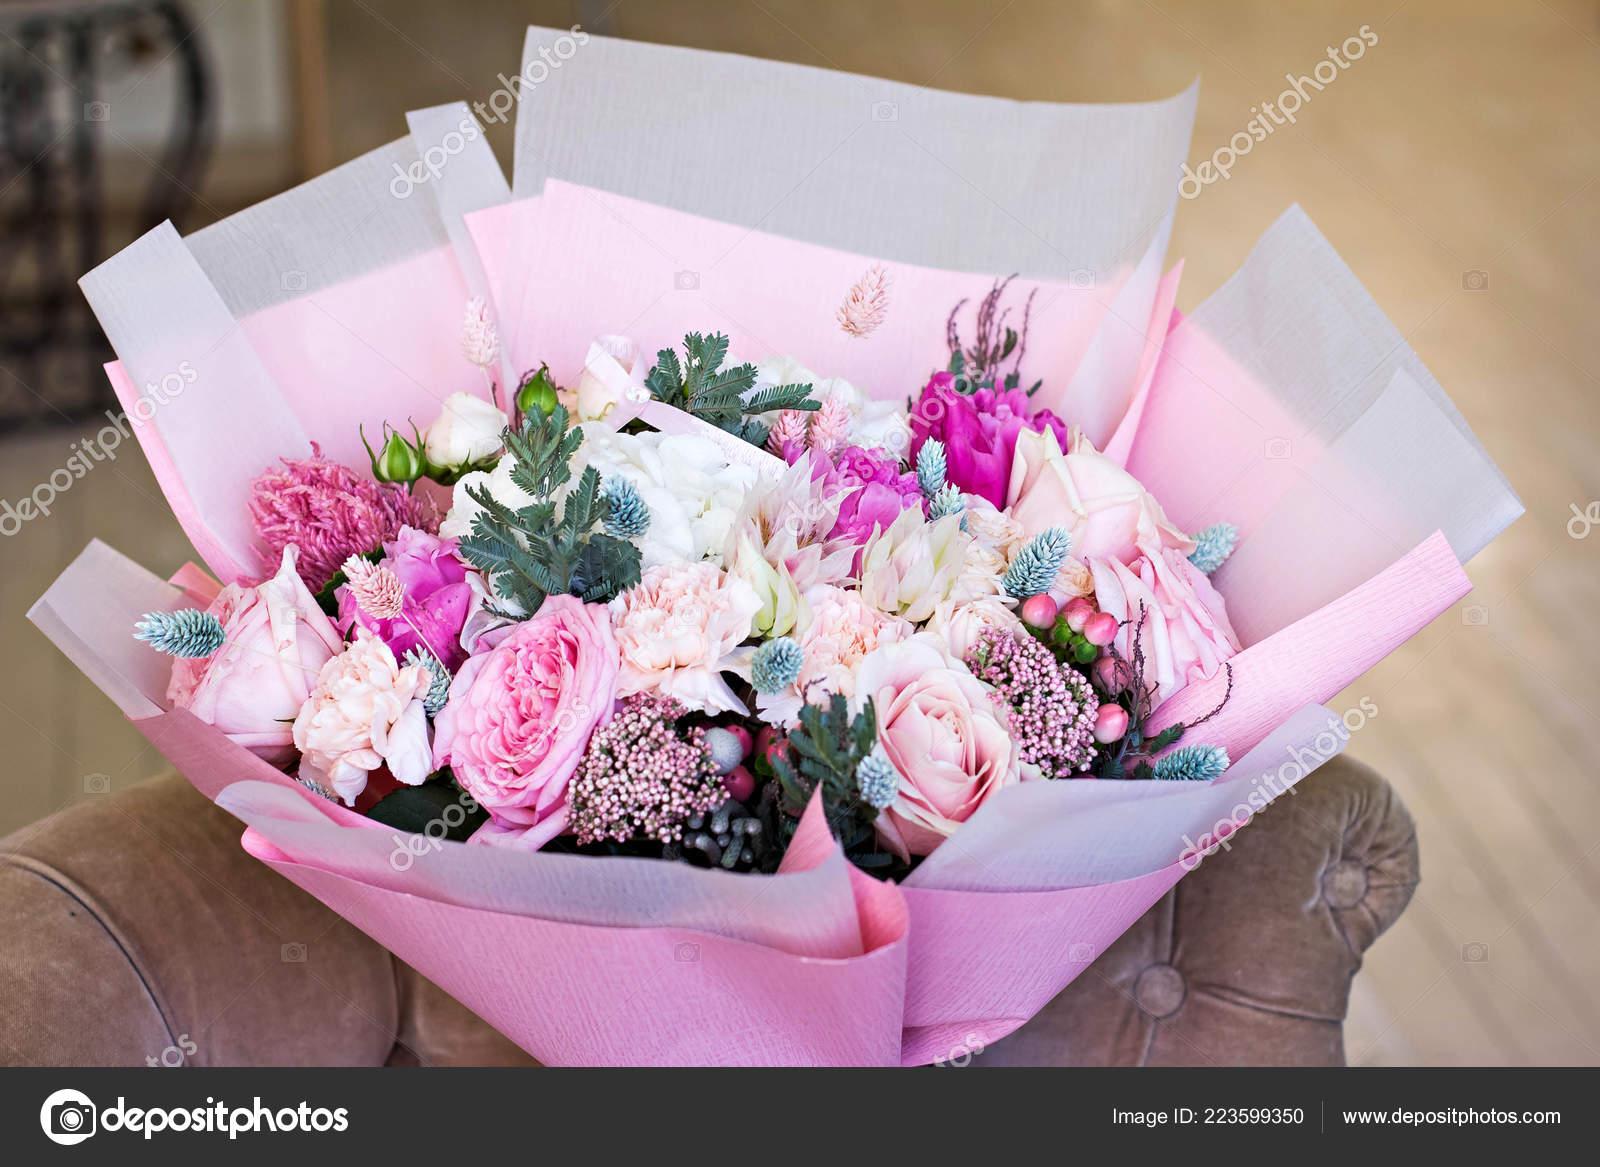 Beautiful Bouquet Wiht Rose Ranunculus Flower Pink Wrapping Paper Roses Stock Photo C Julialototskaya 223599350